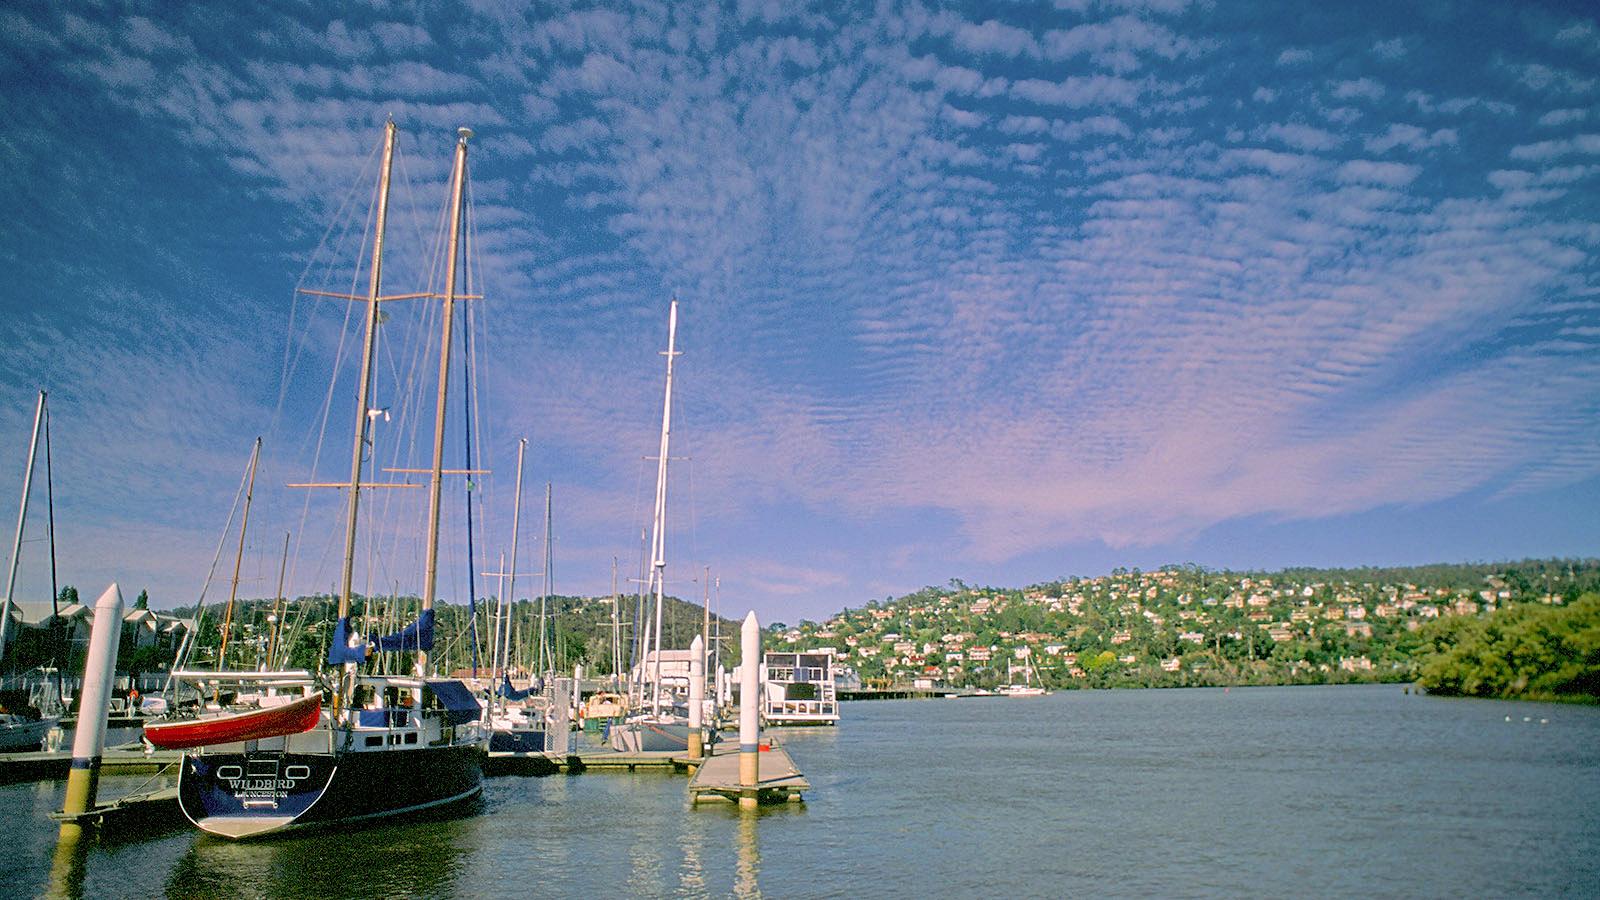 Tasmanien, Launceston: die Marina am Tamar River. Foto: Hilke Maunder